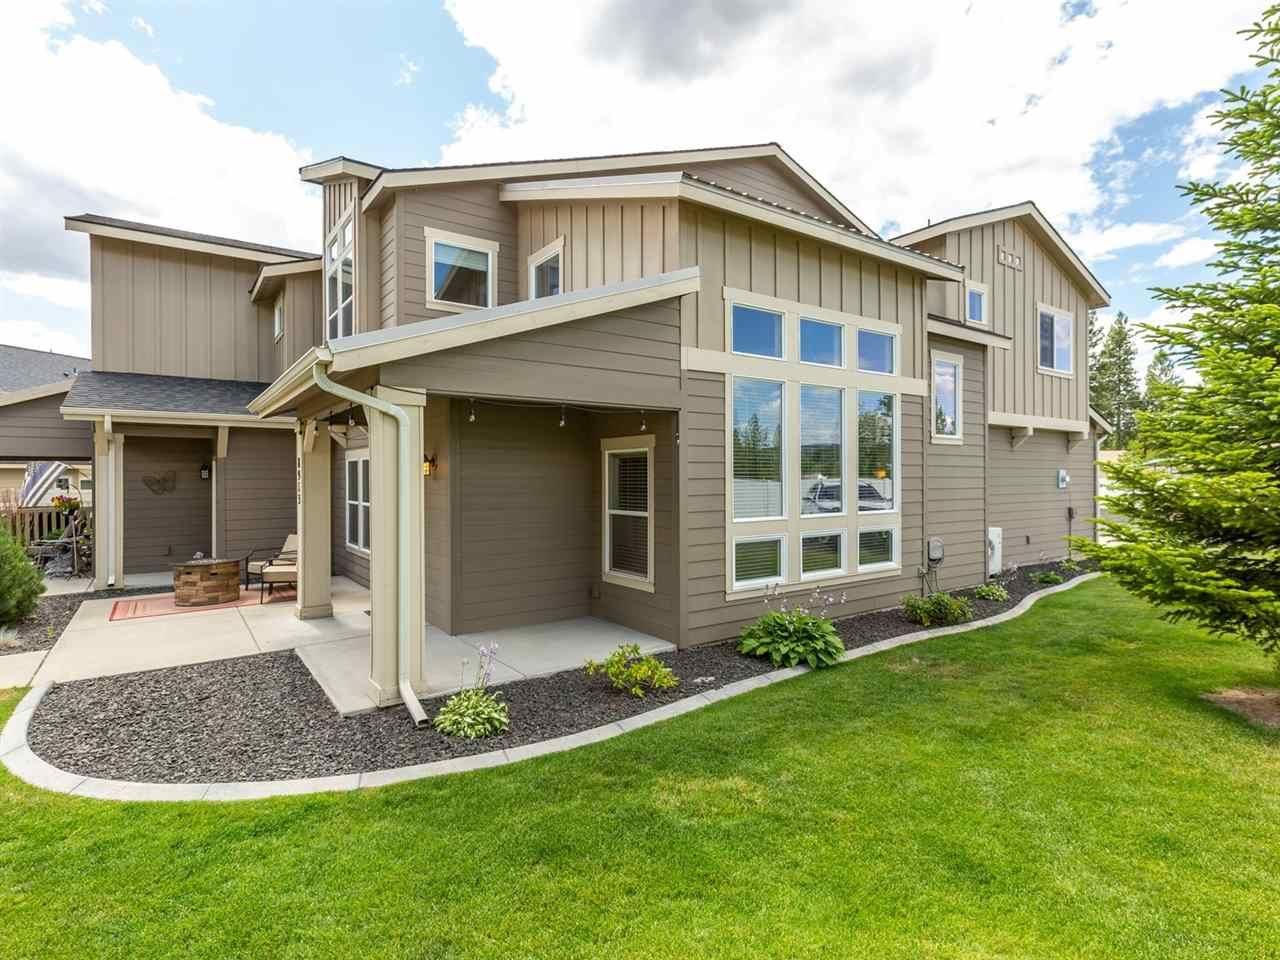 8913 N Barnes Rd, Spokane, WA 99208 - #: 202019021